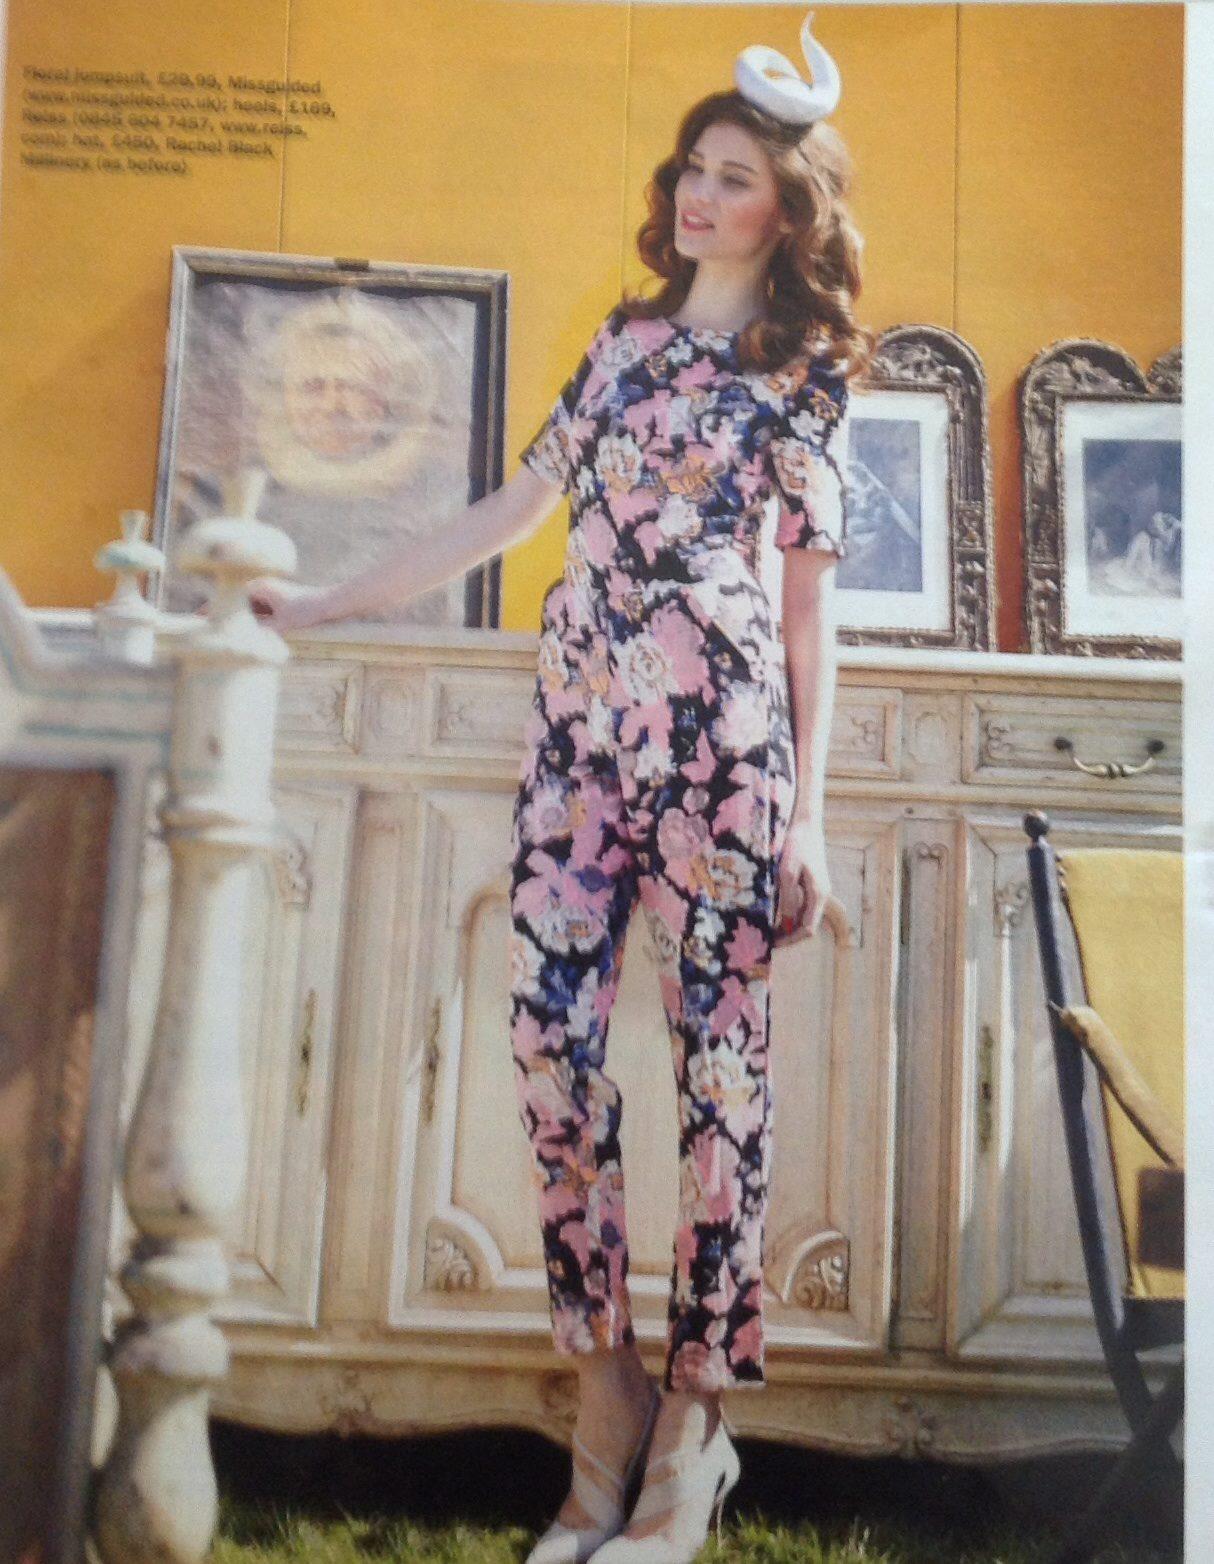 Barbarella in 'S' Magazine, Sunday Express